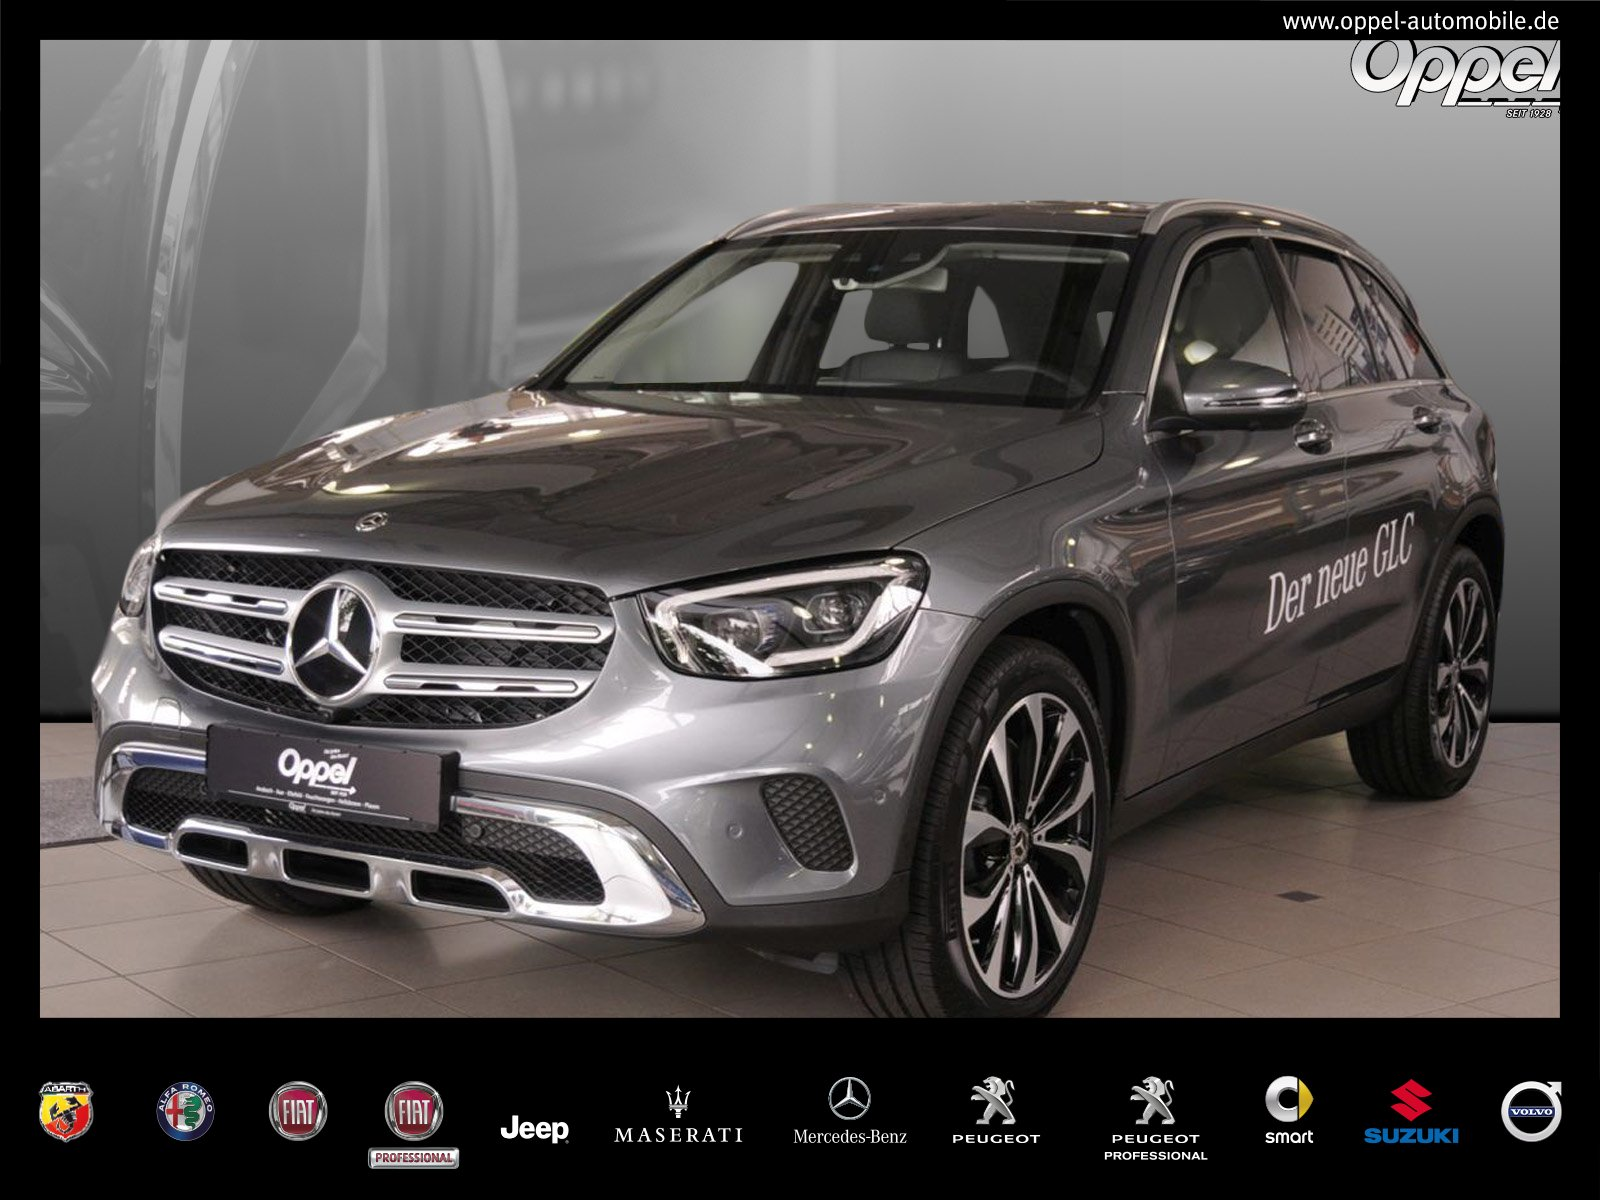 Mercedes-Benz GLC 300 d 4MATIC 360°-K+SOUNDS.+HIGH-END PAKET, Jahr 2019, Diesel